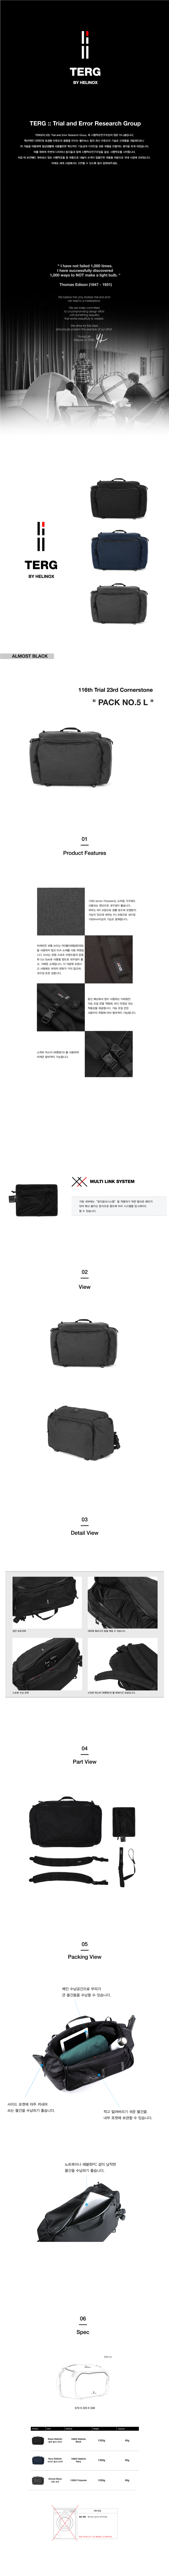 20180419-Pack-no.5-L_almost-balck.jpg